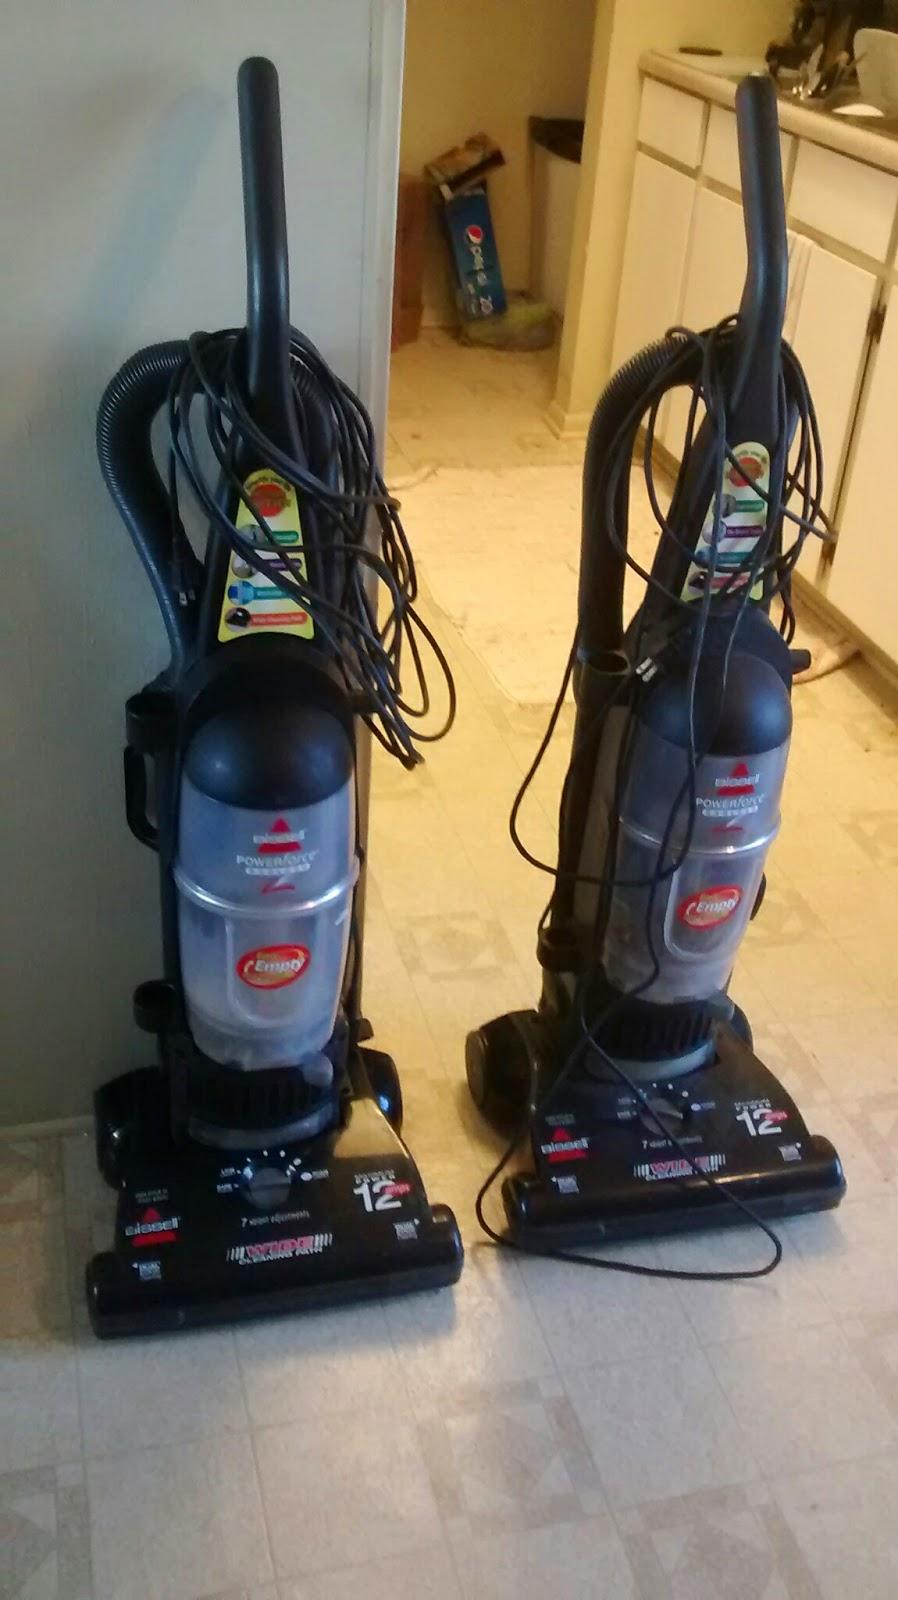 Vintage Affair Vacuum Cleaner Reassemble